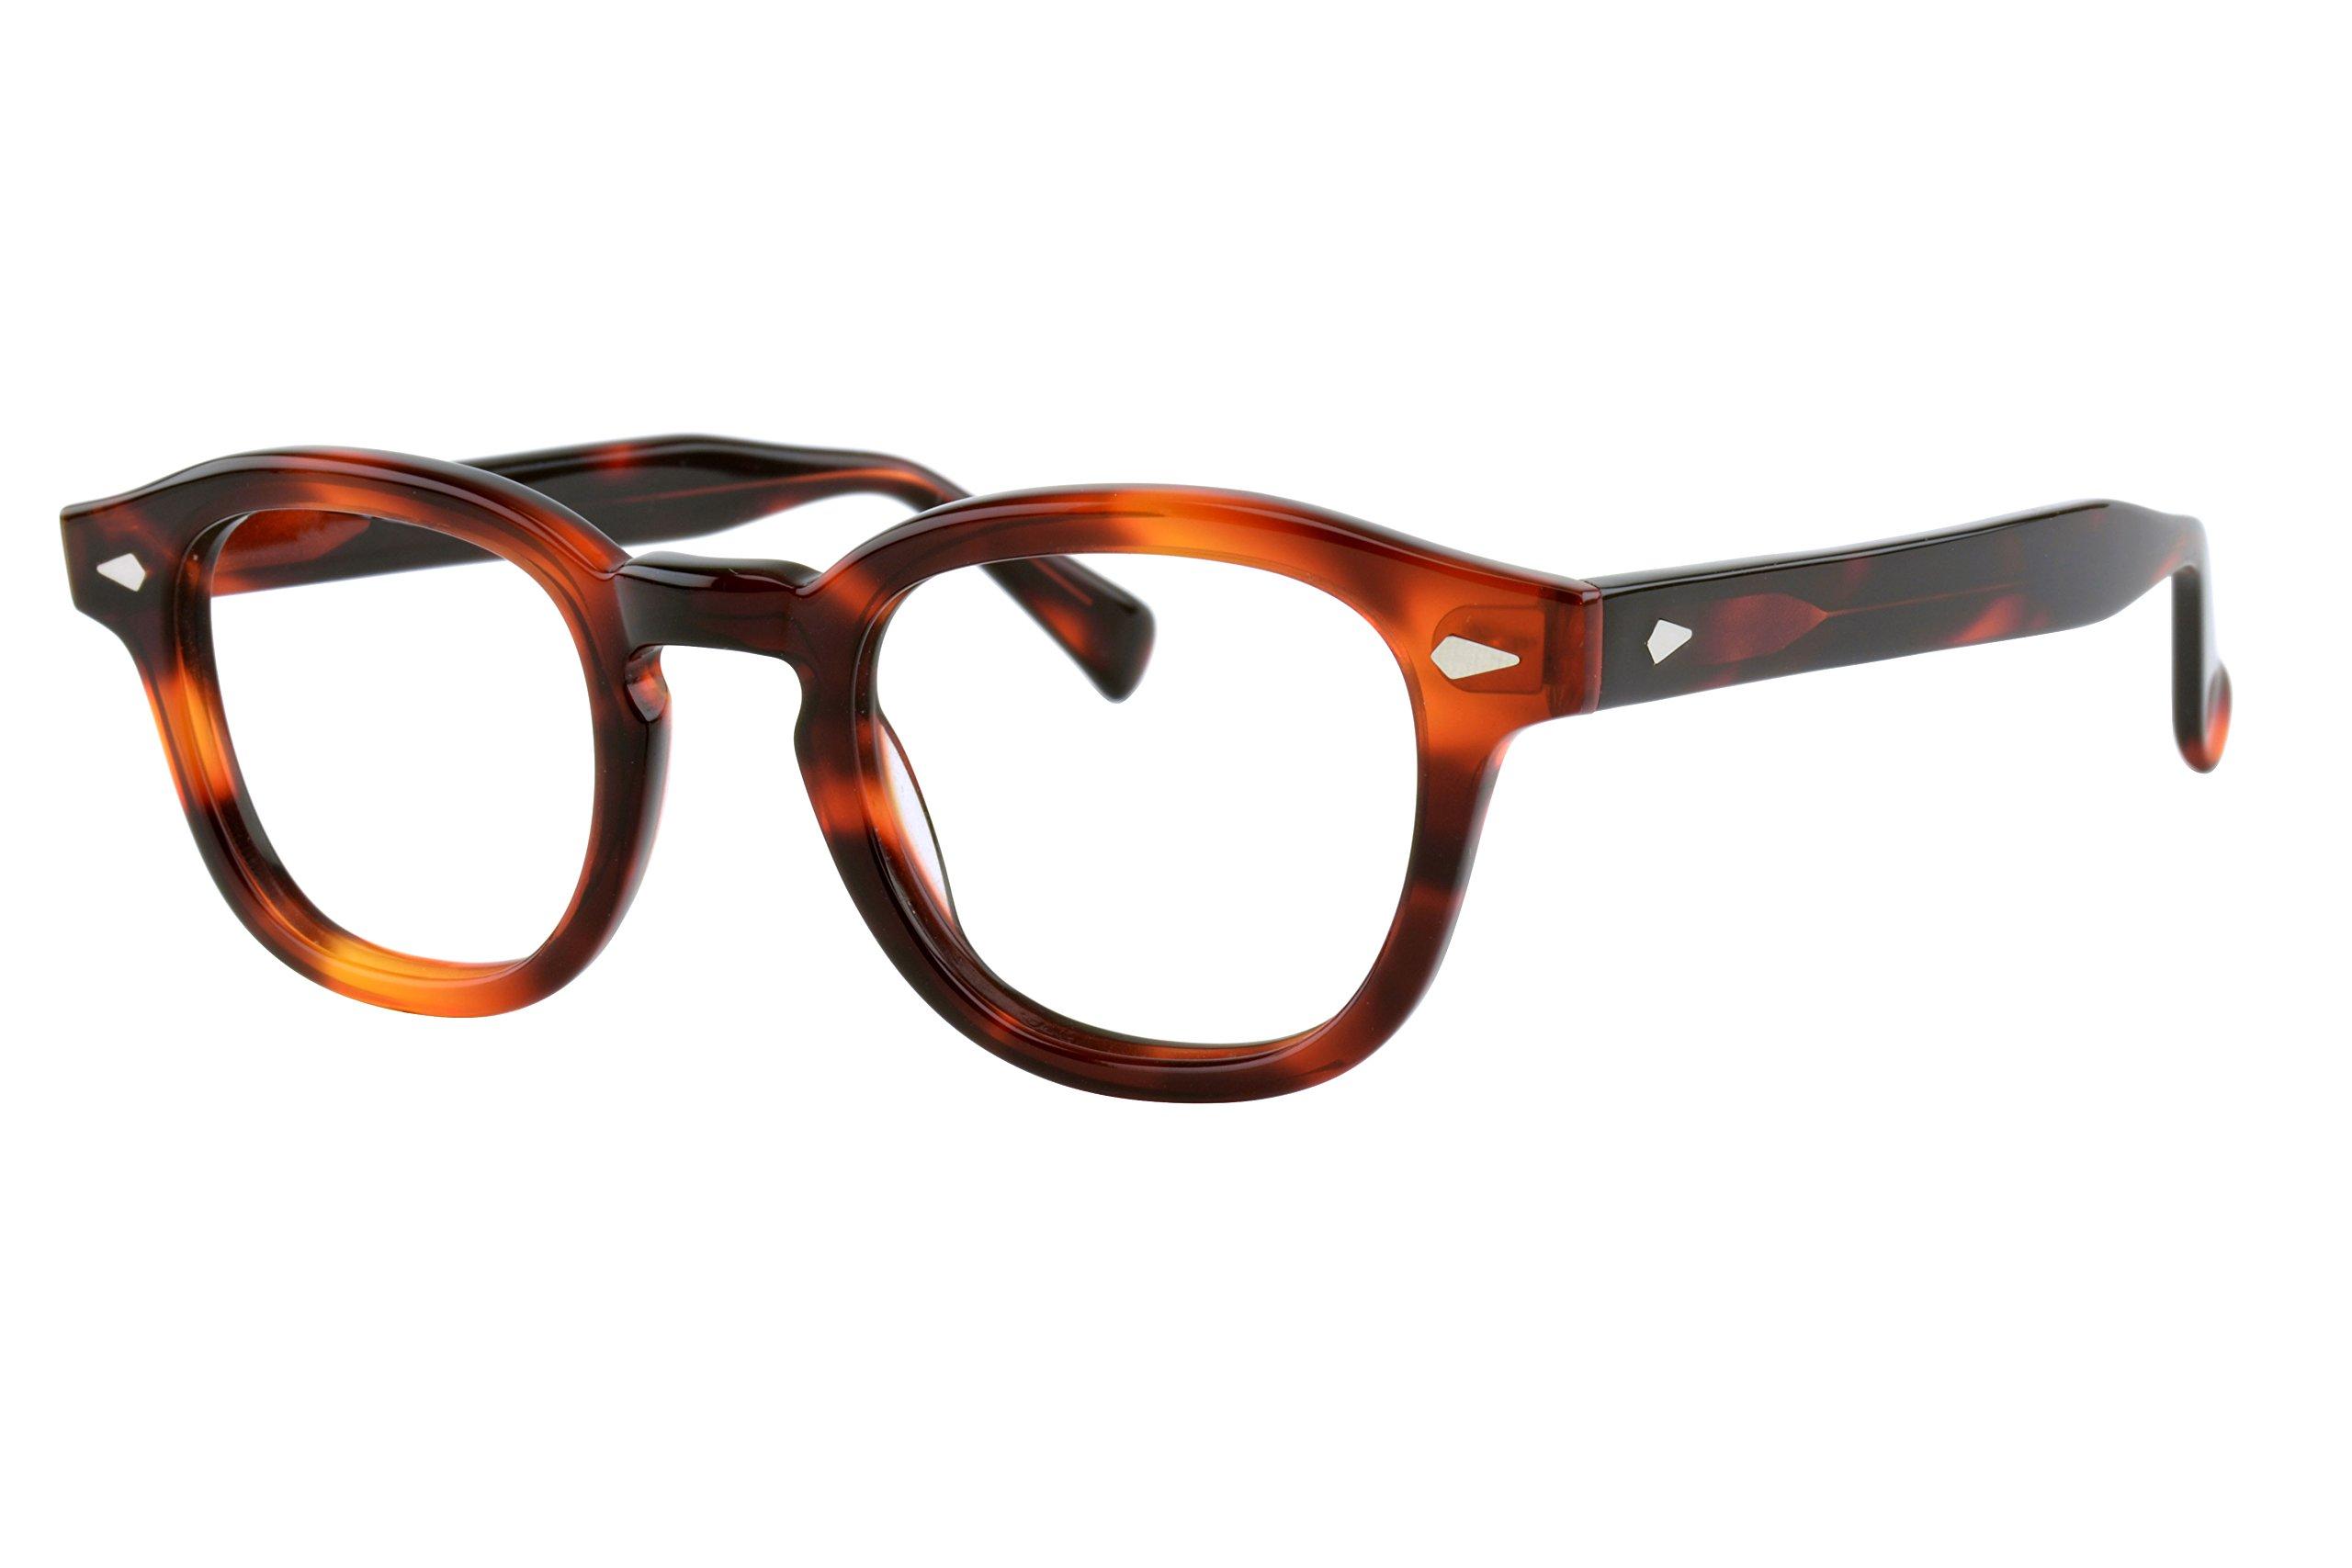 Verona Love Hand-Made Acetate Non Prescription Eyeglasses Frame Premium EyeWear Clear Lens Vintage Style Glasses Frames (VLV46 C003)